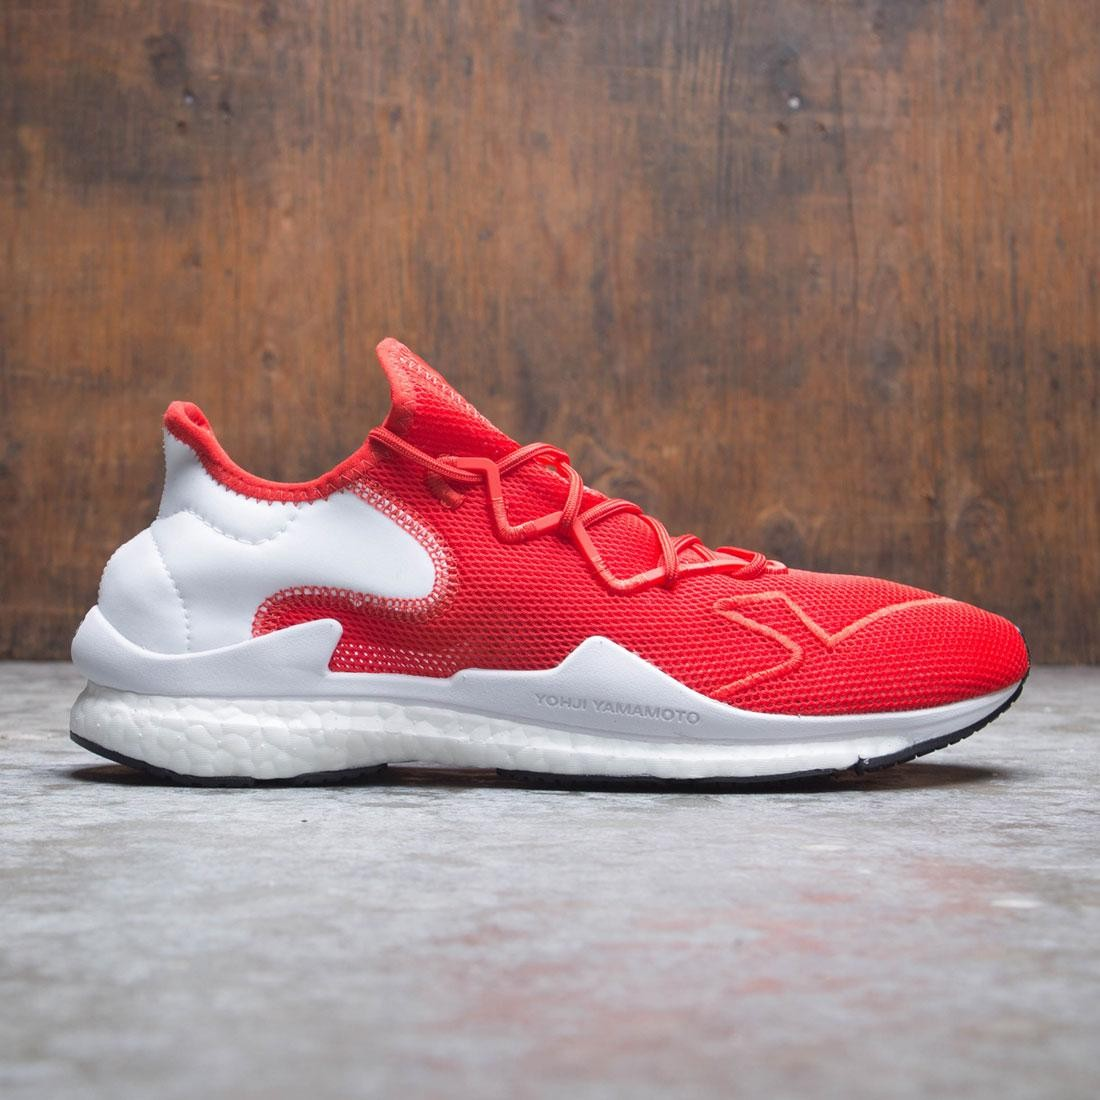 Adidas Y-3 Men Adizero Runner red